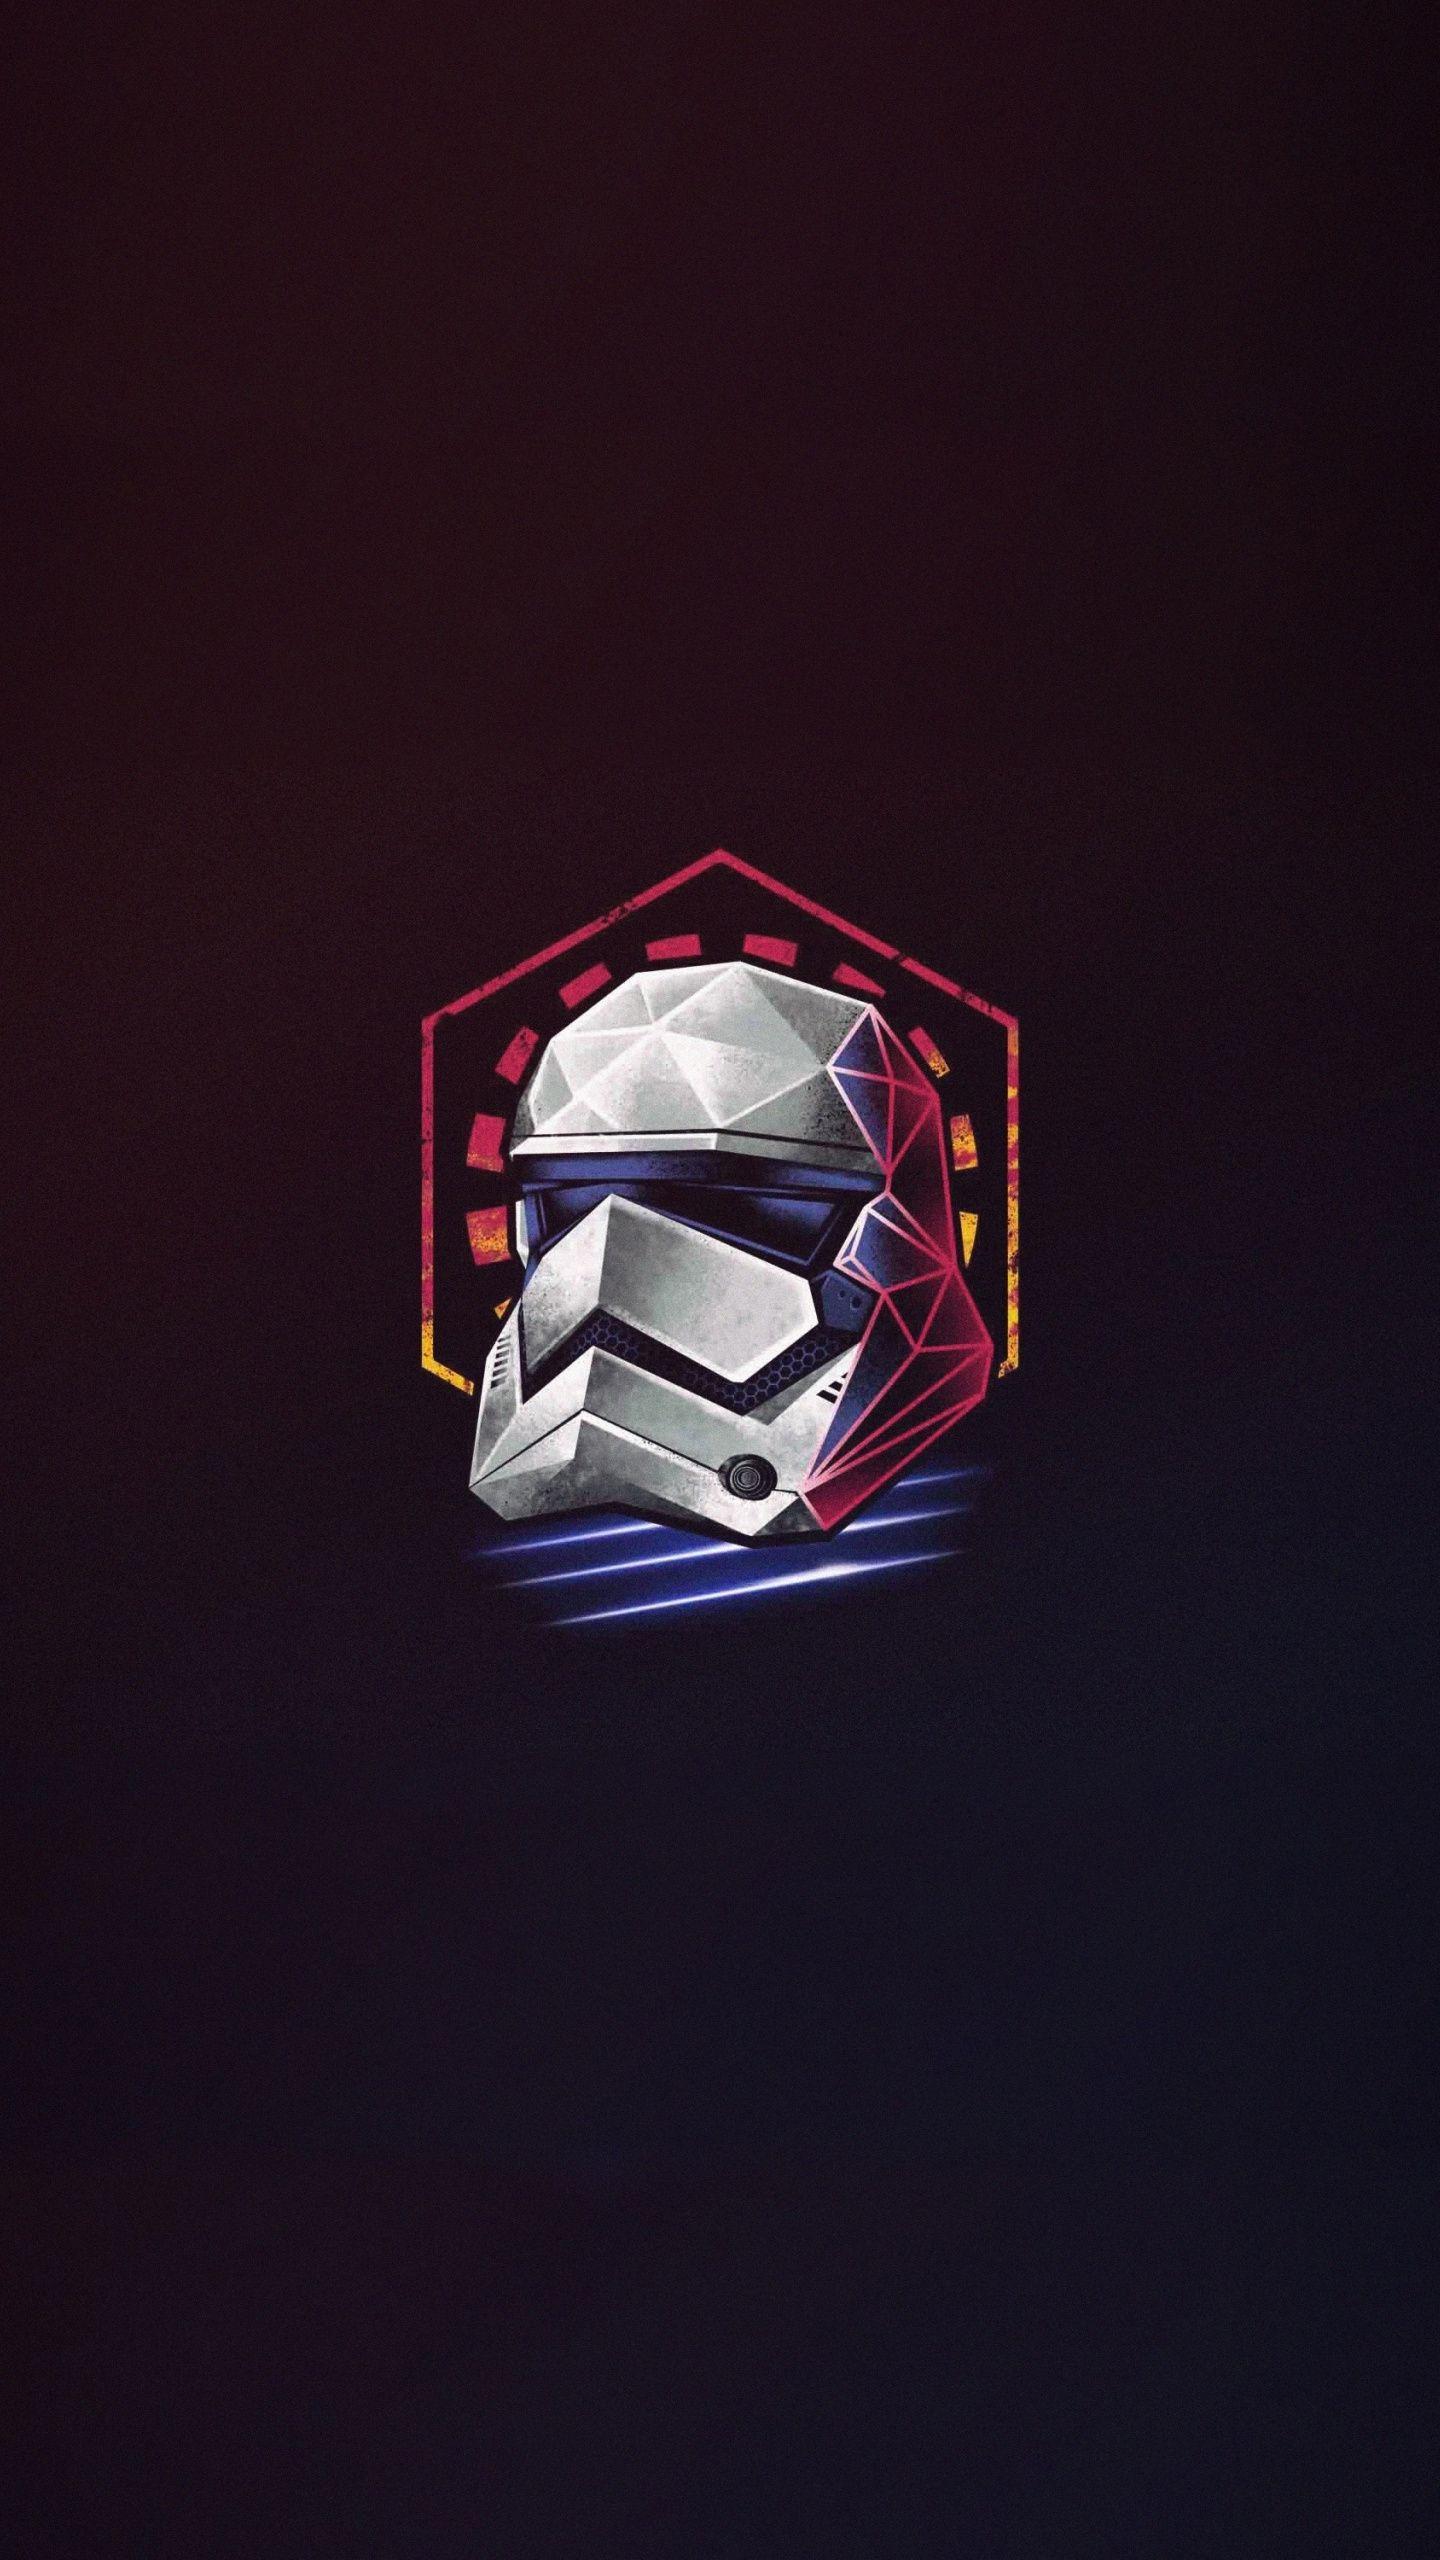 Download 1440x2560 Wallpaper Minimal Star Wars Stormtrooper Helmet Artwork Qhd Samsung Galaxy S6 In 2020 Star Wars Helmet Cool Wallpapers For Phones Stormtrooper